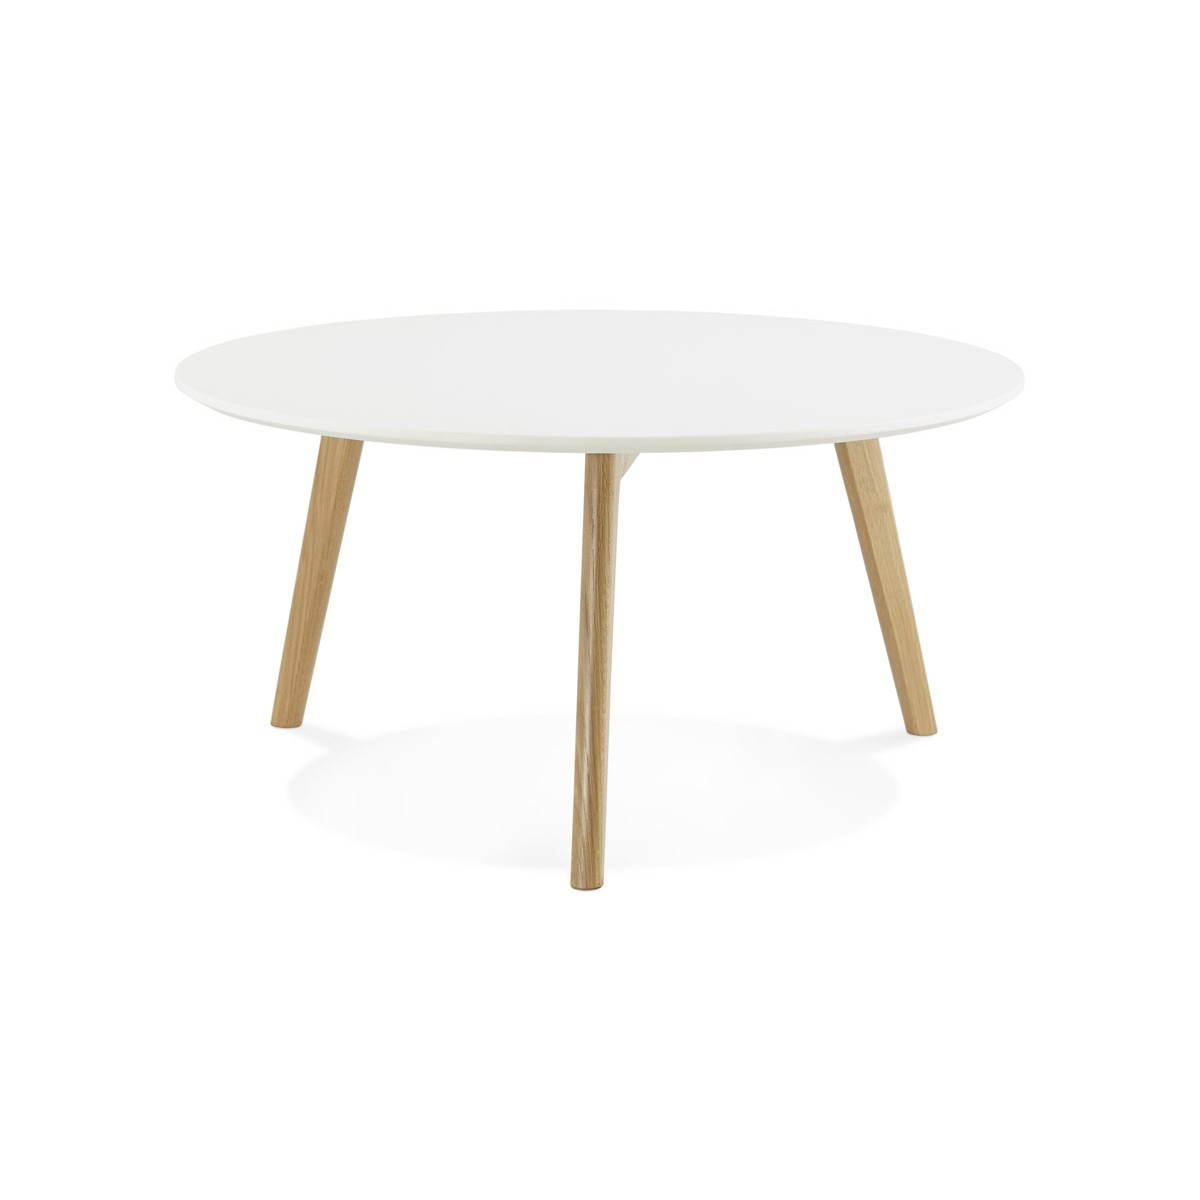 tarot scandinavian coffee table in wood